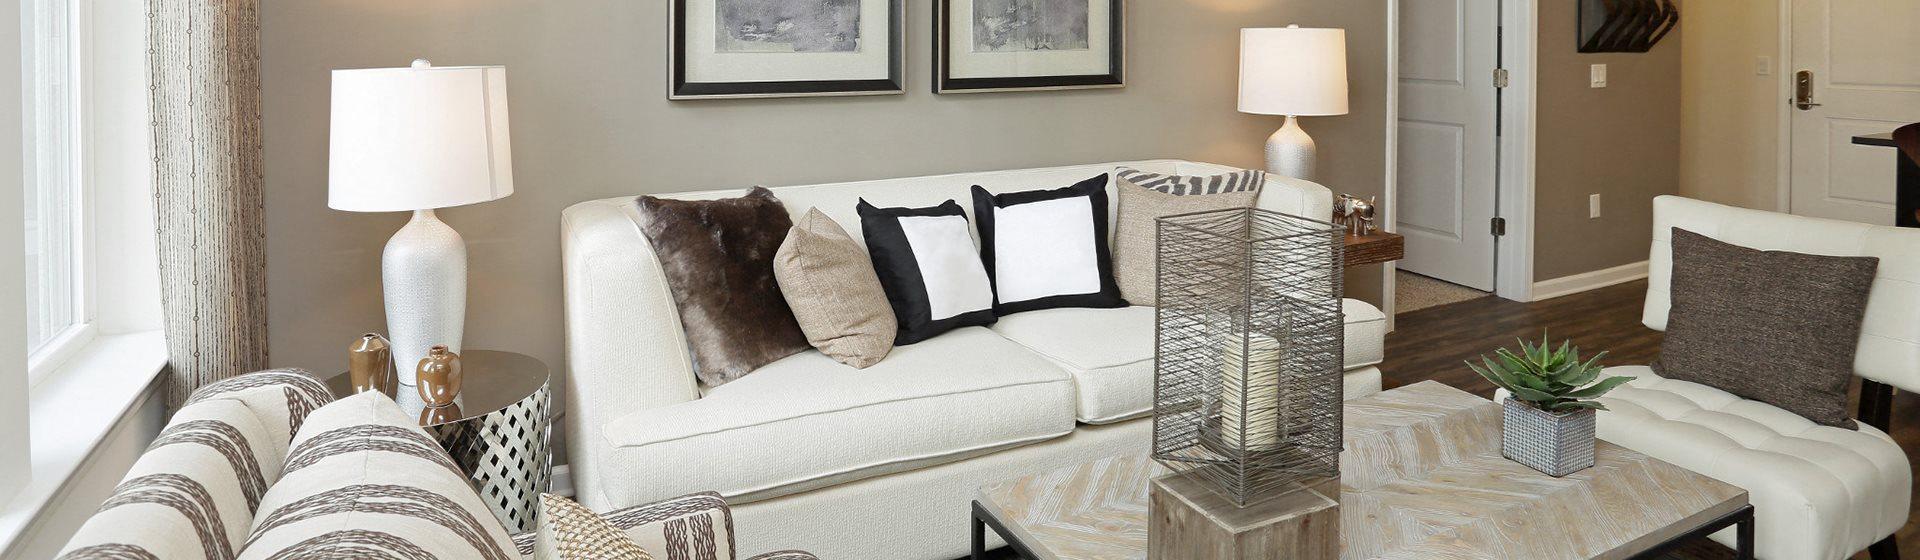 the allure mineola floor plans, apartments for rent mineola, ny